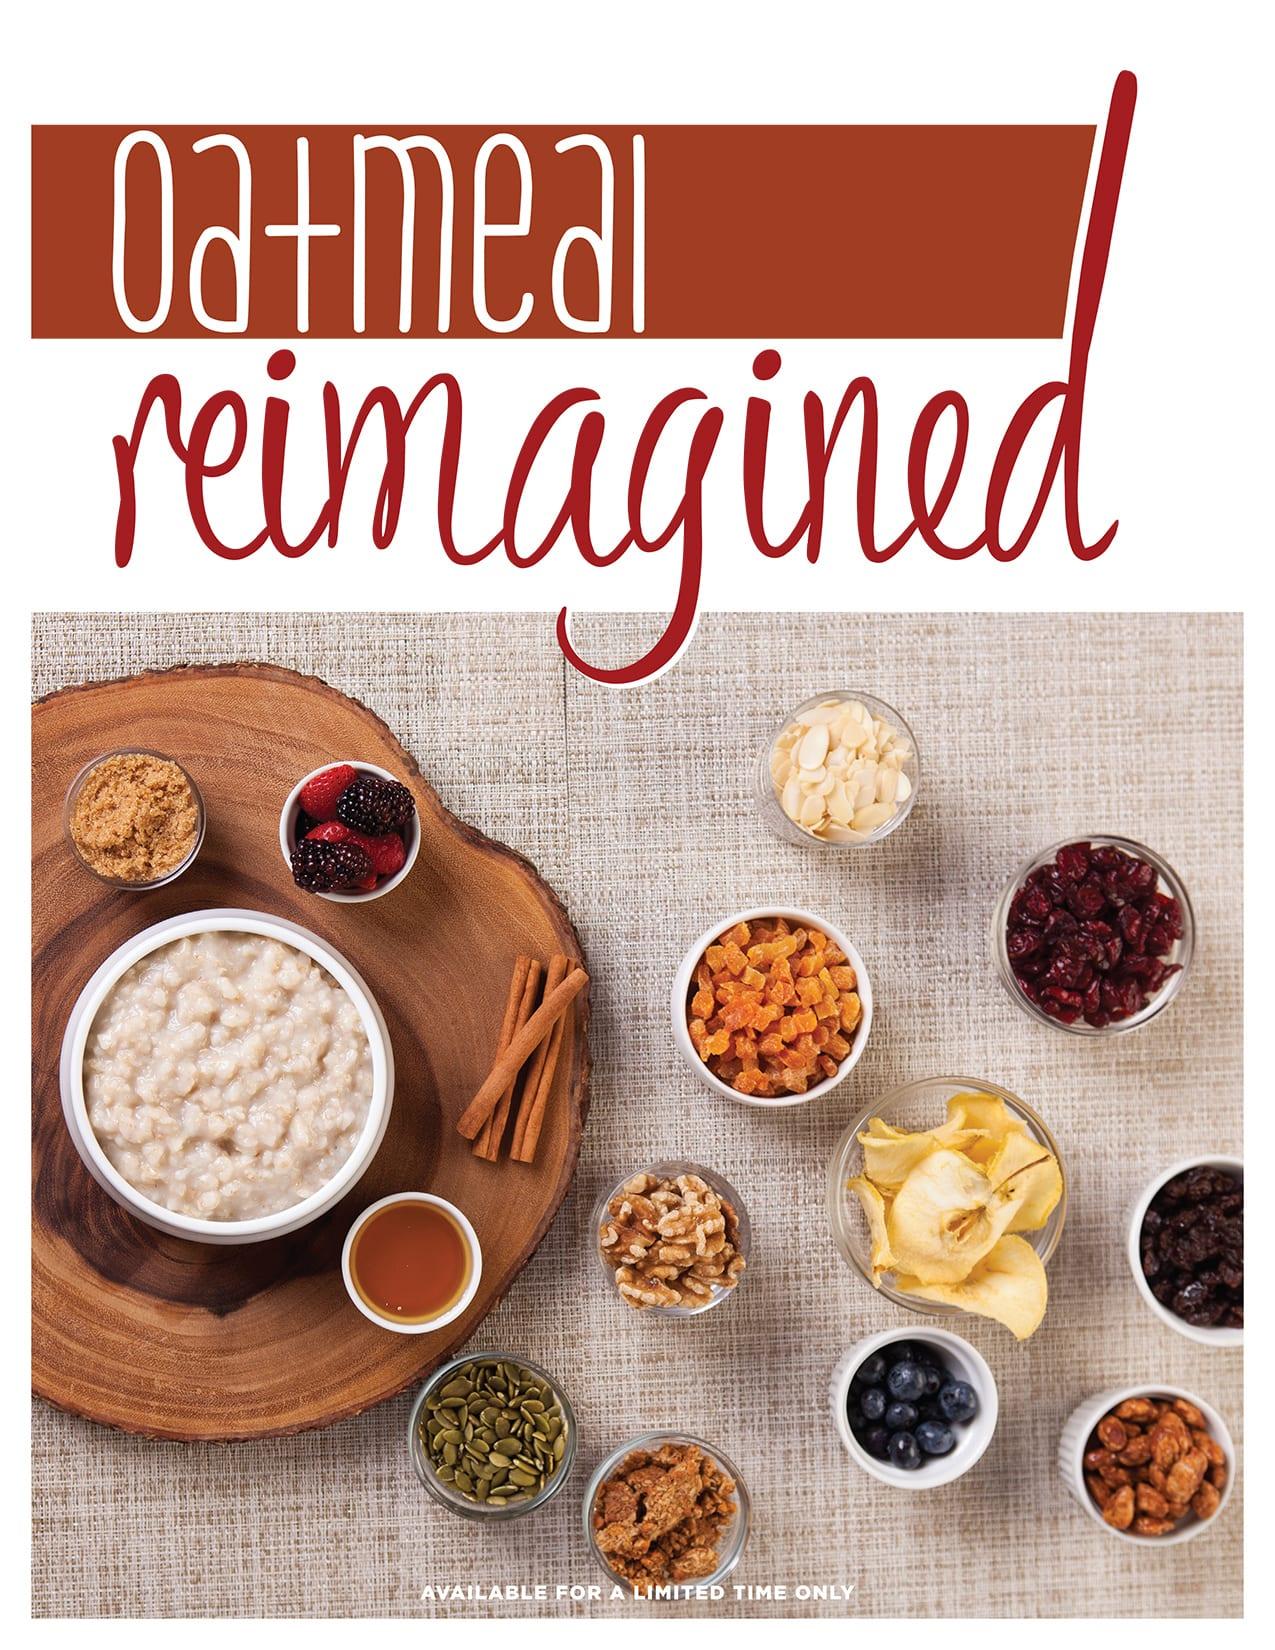 1601_january-LTOs_oatmeal-reimagined_8.5x11_static